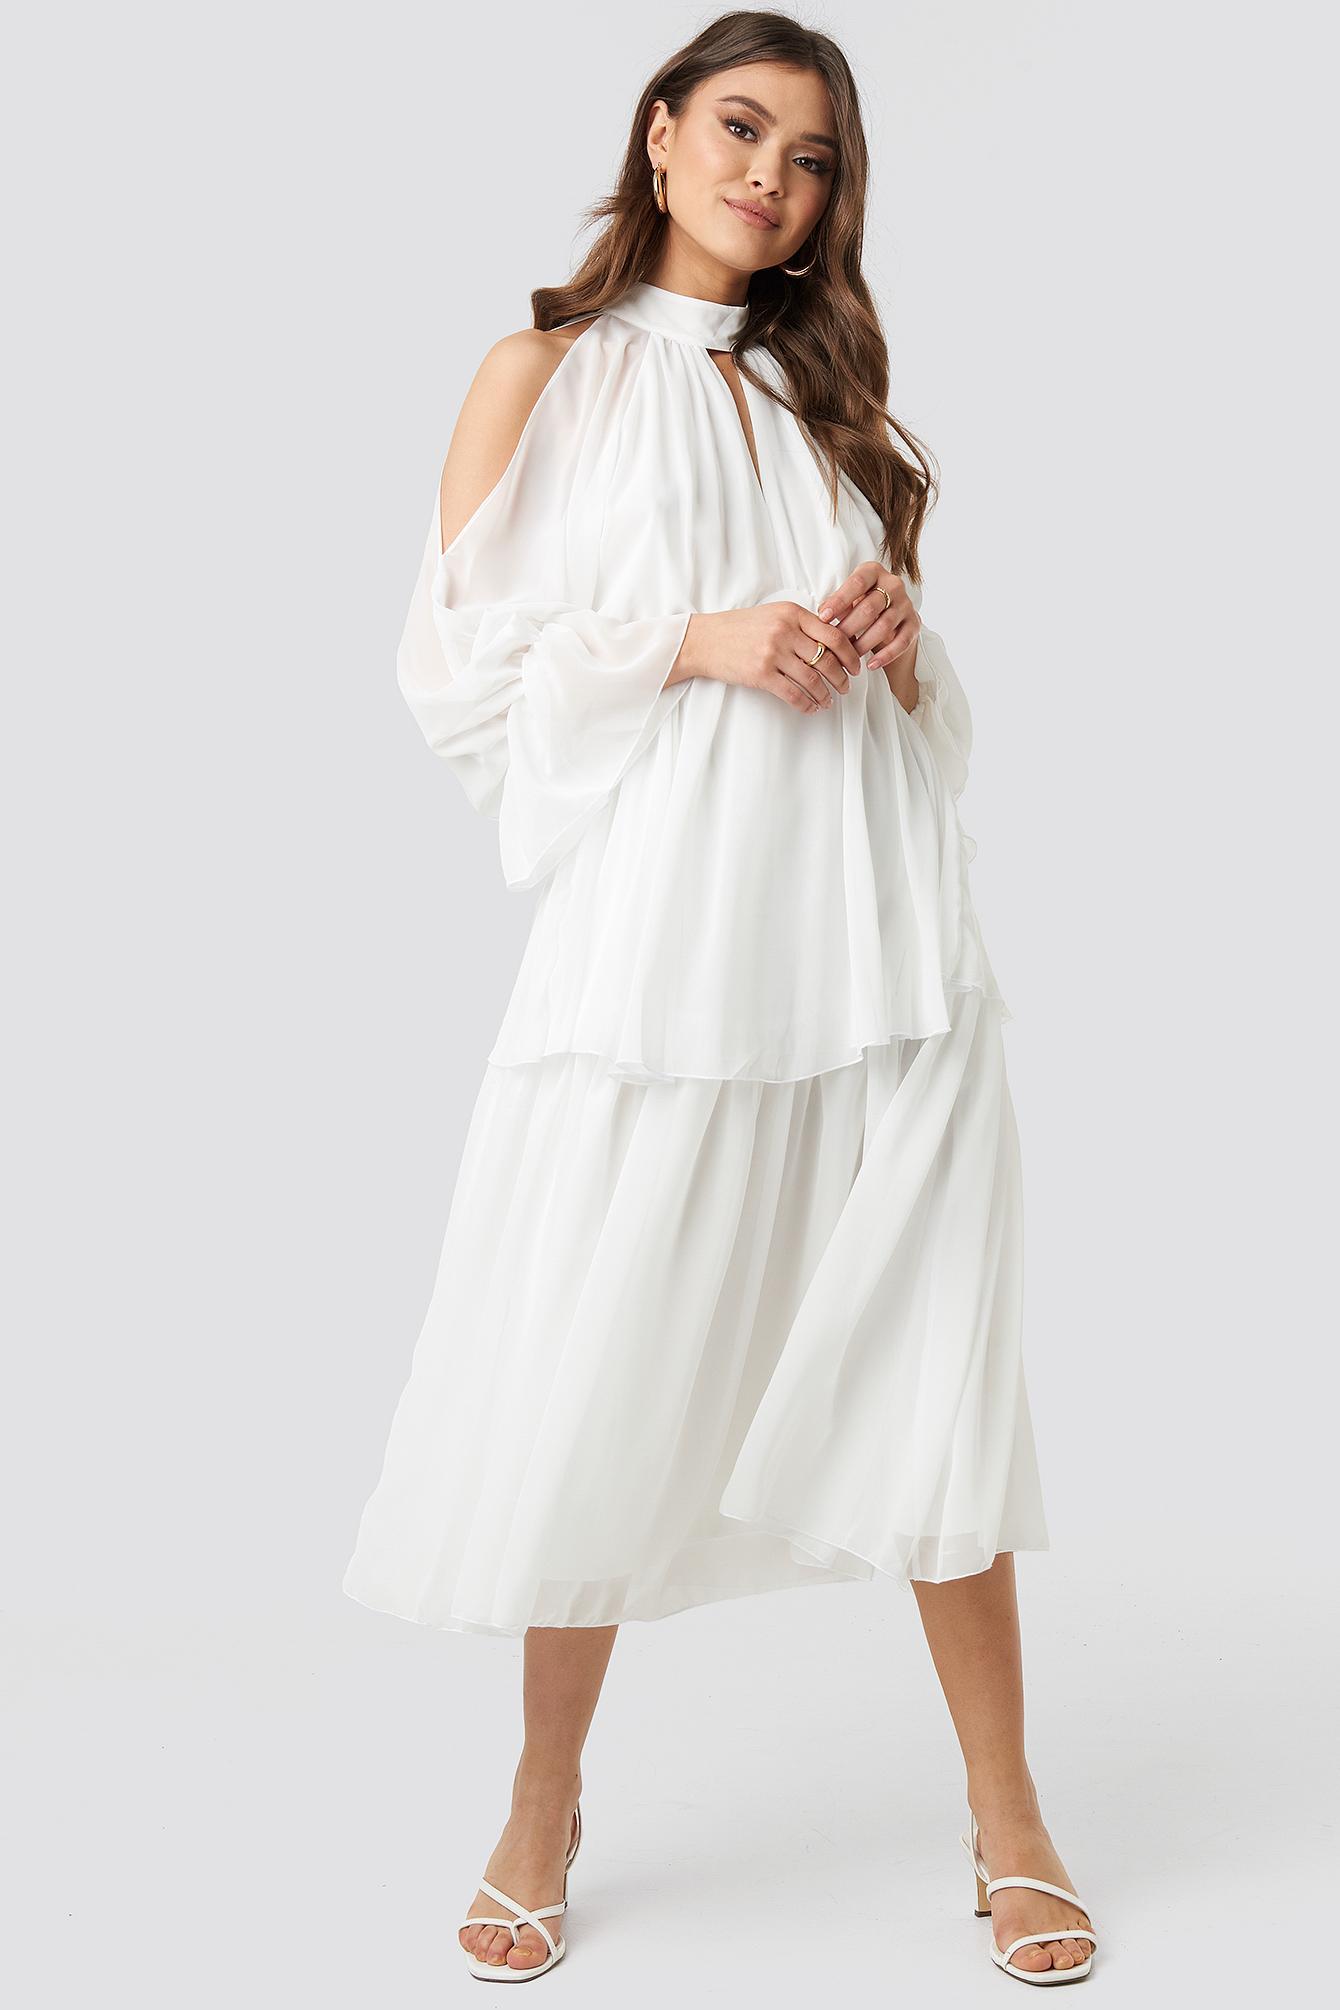 00671e01a Trendyol No Shoulder Long Sleeve Dress White in White - Lyst